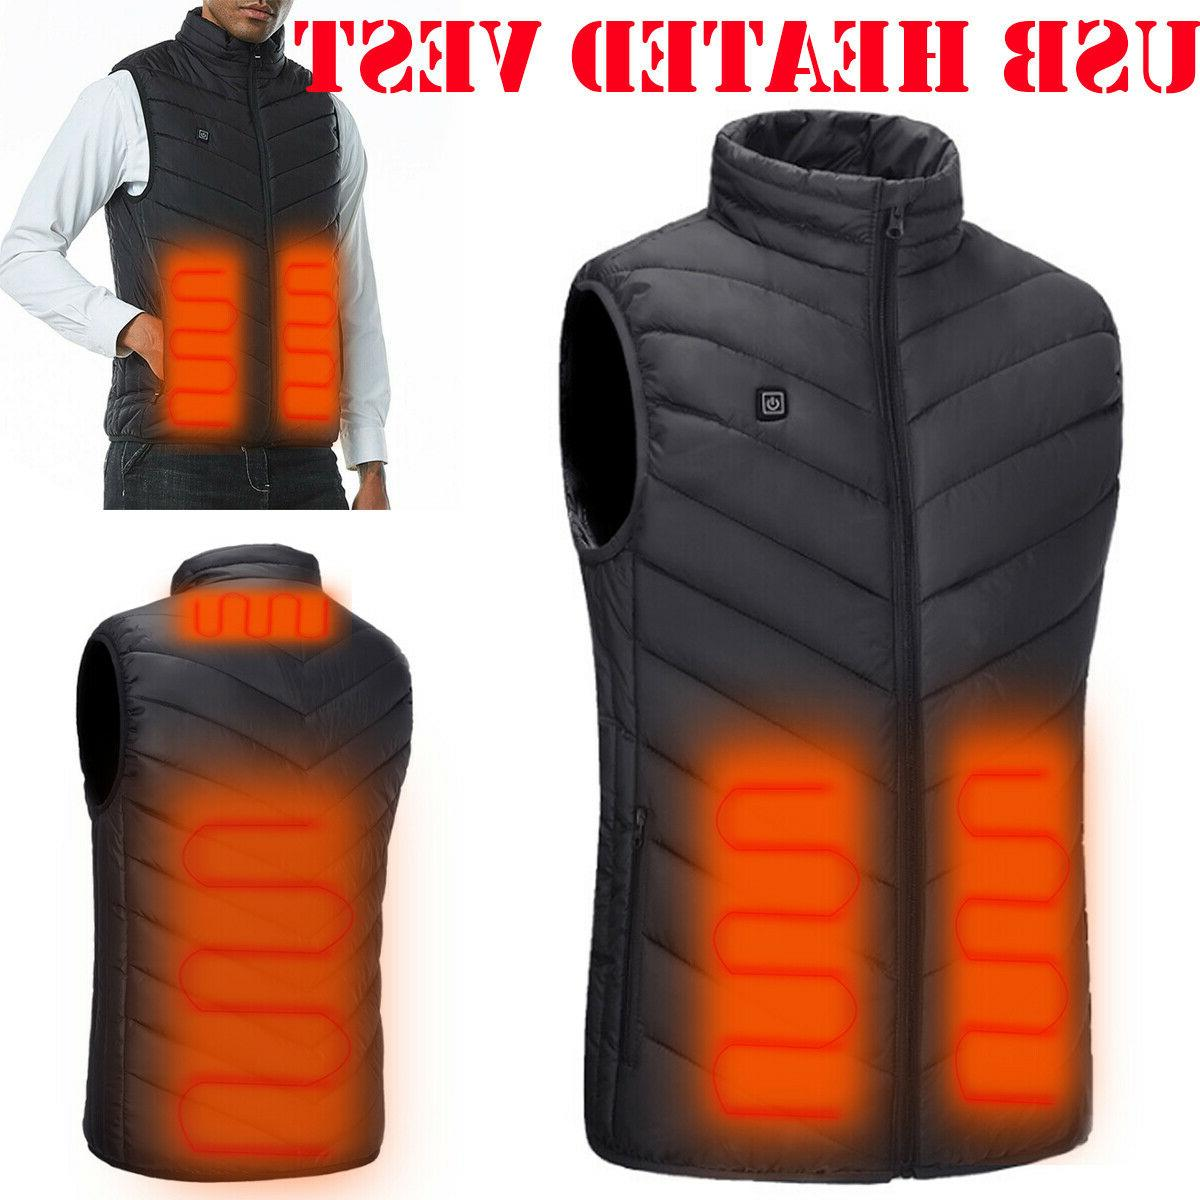 electric usb heated vest jacket coat warm